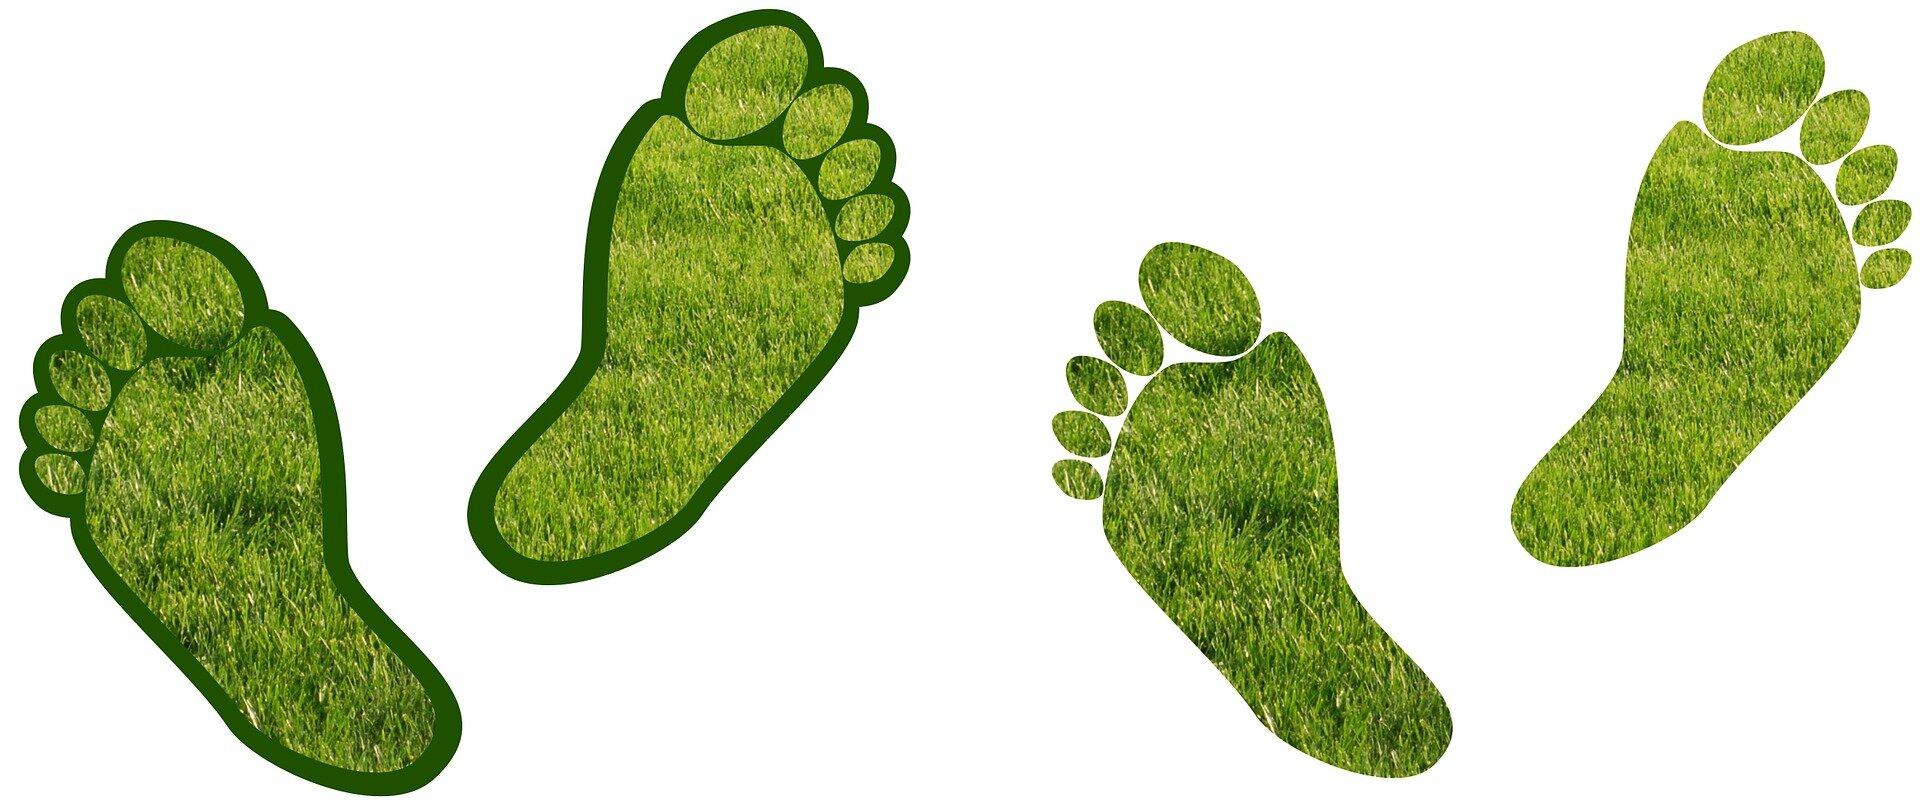 Economists Find Carbon Footprint Grows with Parenthood